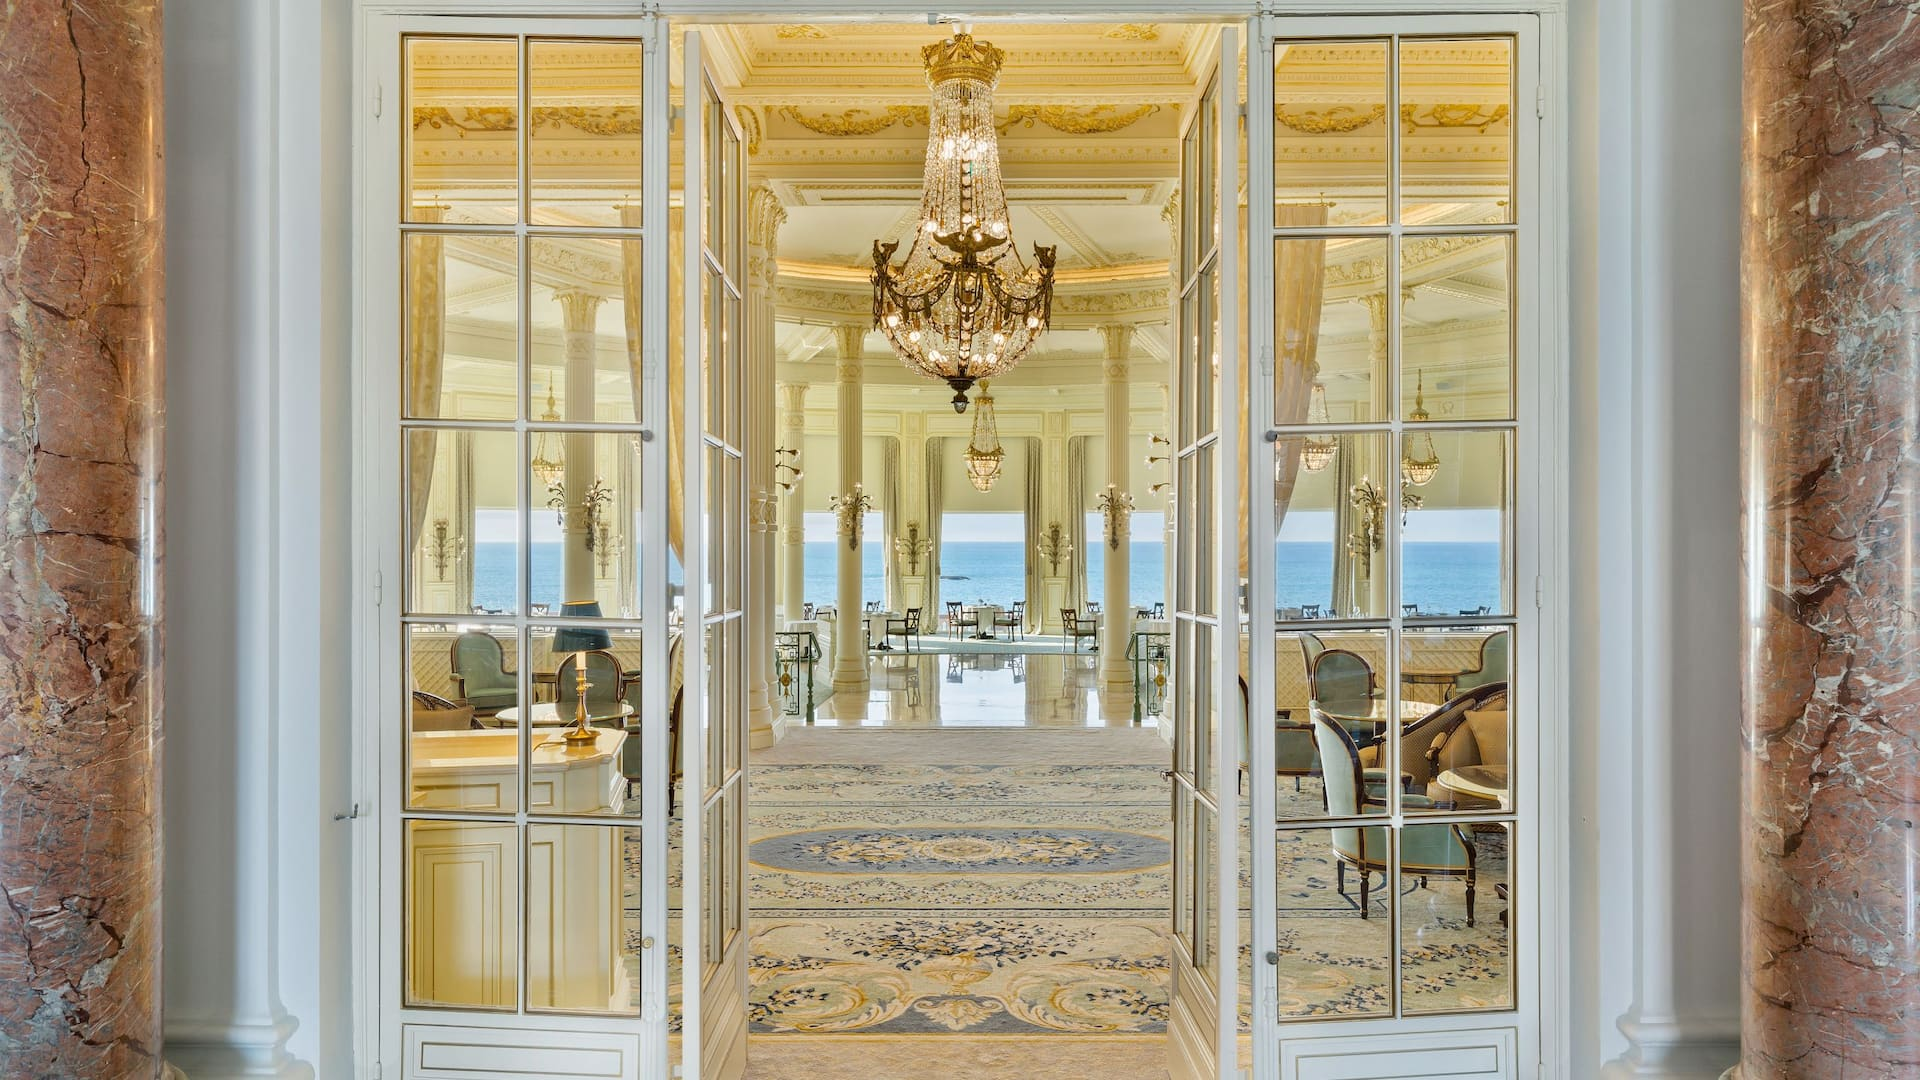 La Rotonde Restaurant - Hôtel du Palais in Biarritz - Top Restaurant